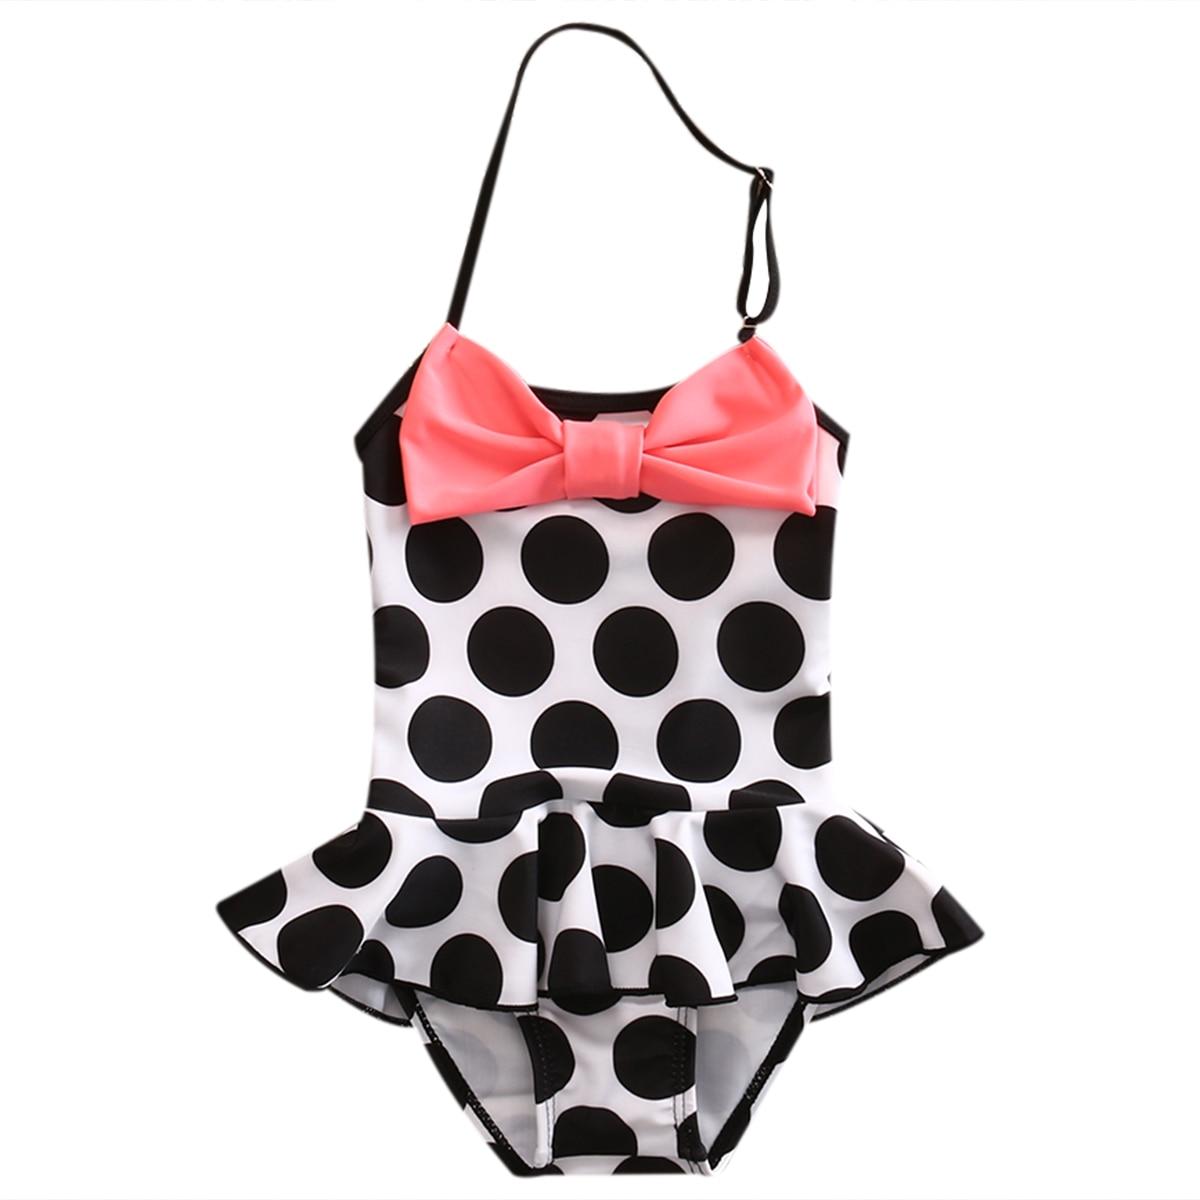 Kids Baby Girl Bikini Suit Polka Dot Bow Swimwear Swimsuit Outfits Bathing Suit